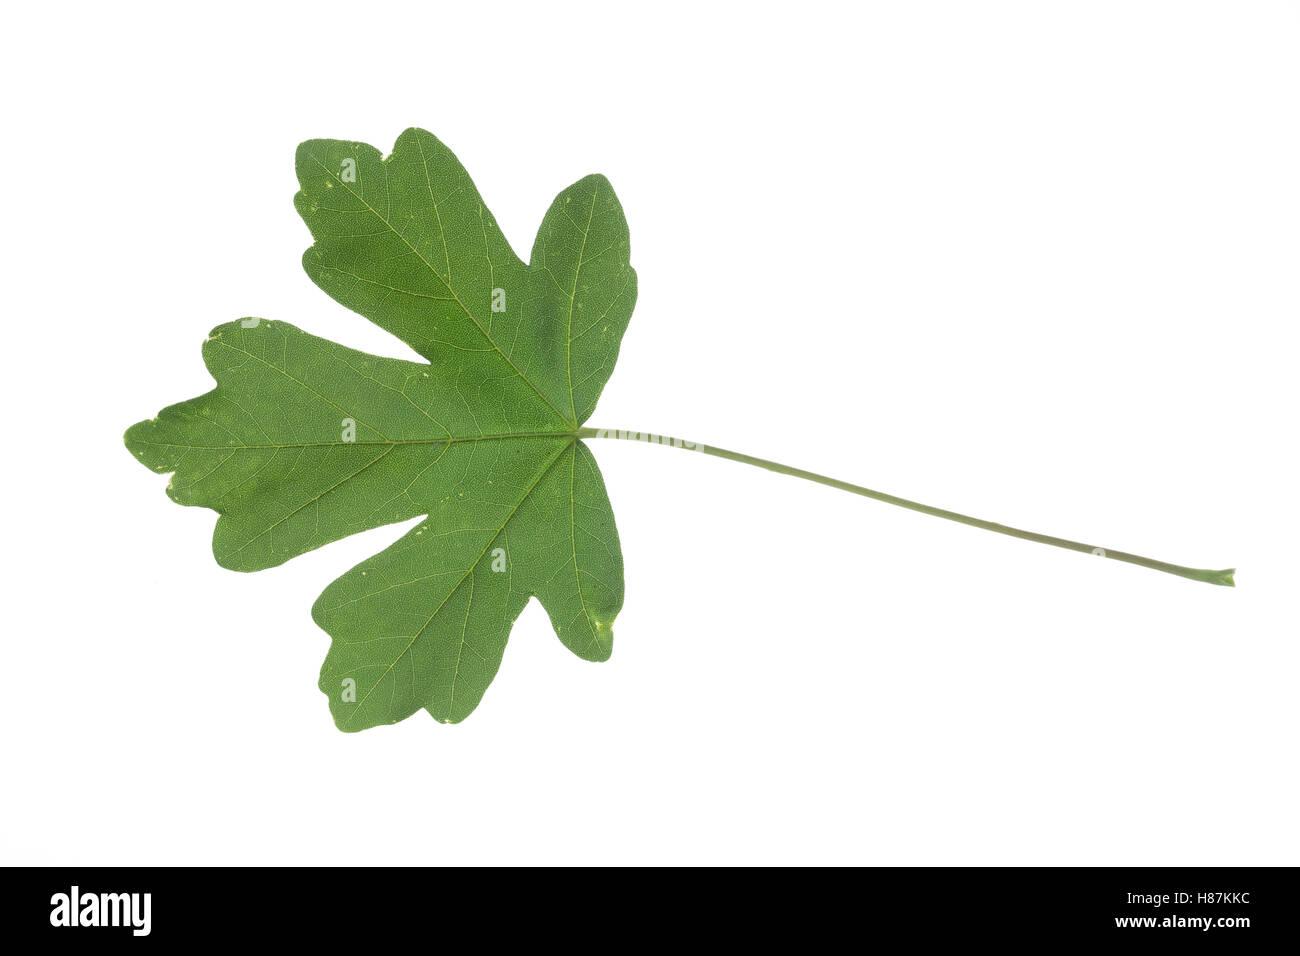 Feld-Ahorn, Feldahorn, Ahorn, Acer campestre, Field Maple, Hedge Maple, Erable champêtre. Blatt, Blätter, - Stock Image